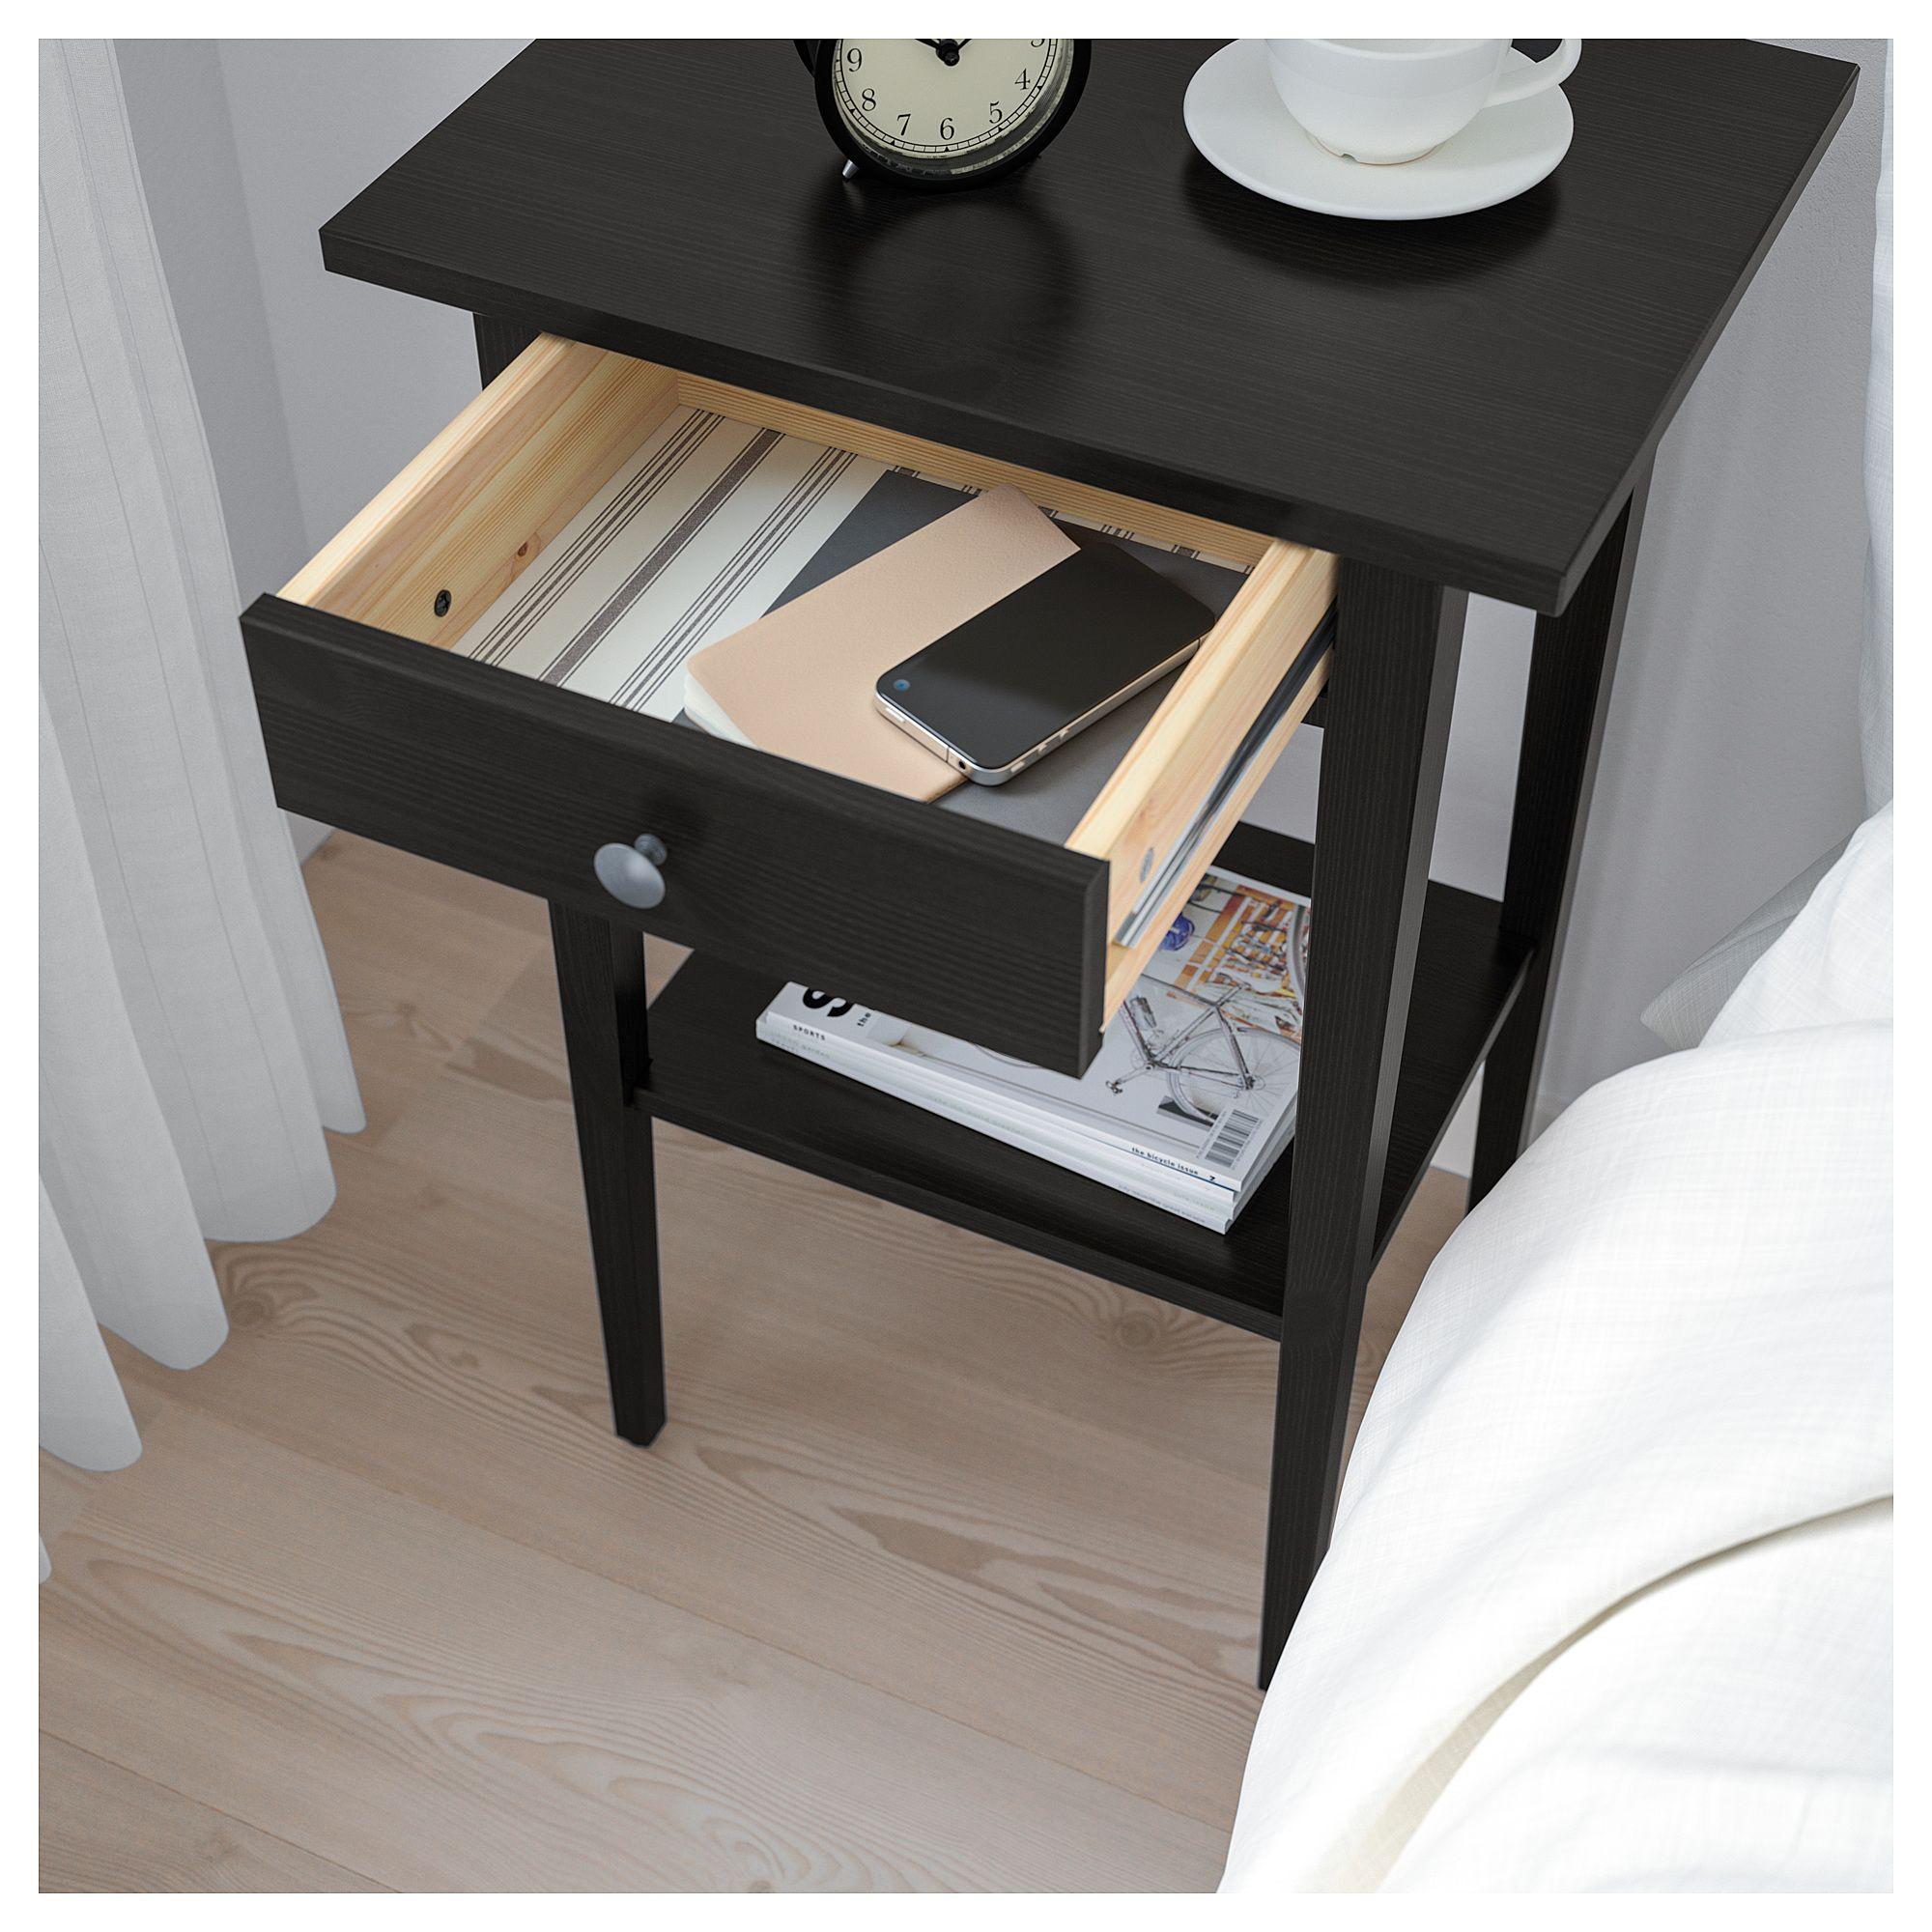 Ikea Hemnes Nightstand Black Brown In 2019 Products